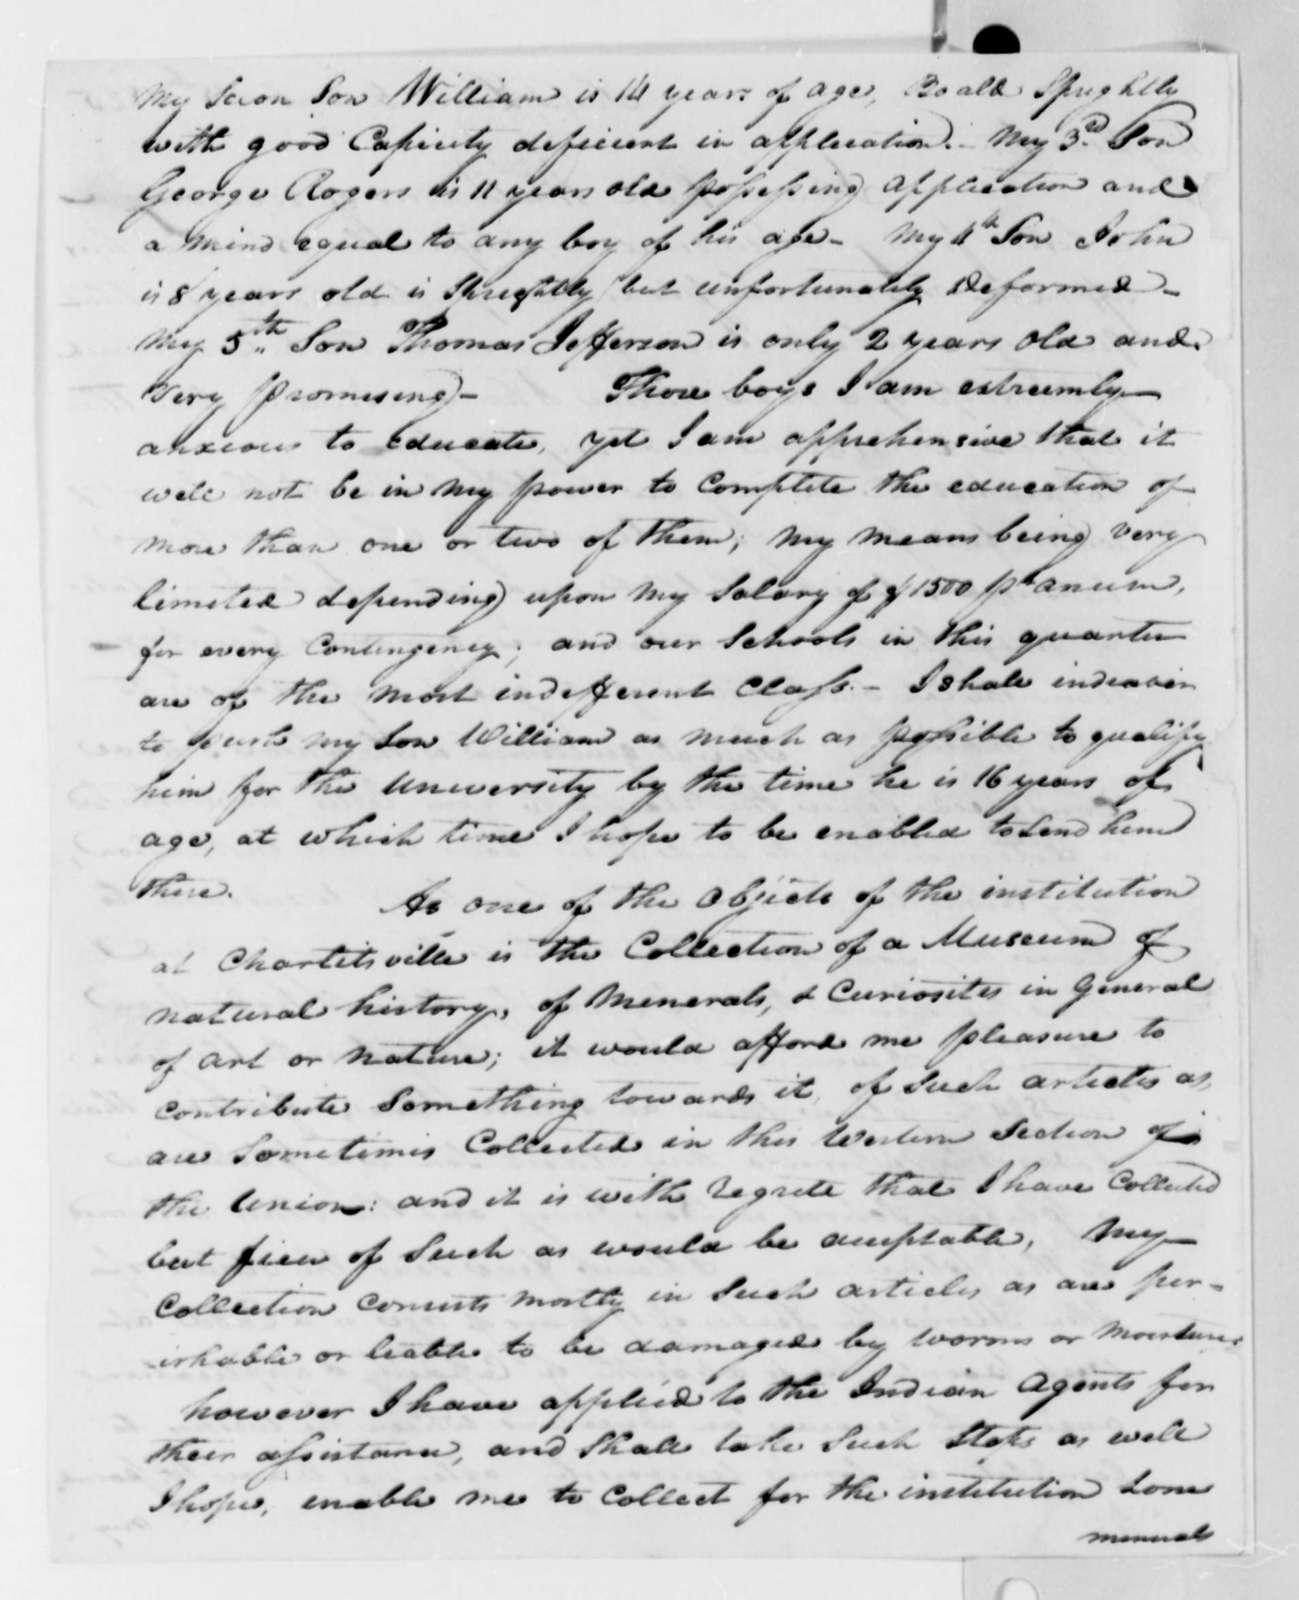 William Clark to Thomas Jefferson, December 15, 1825